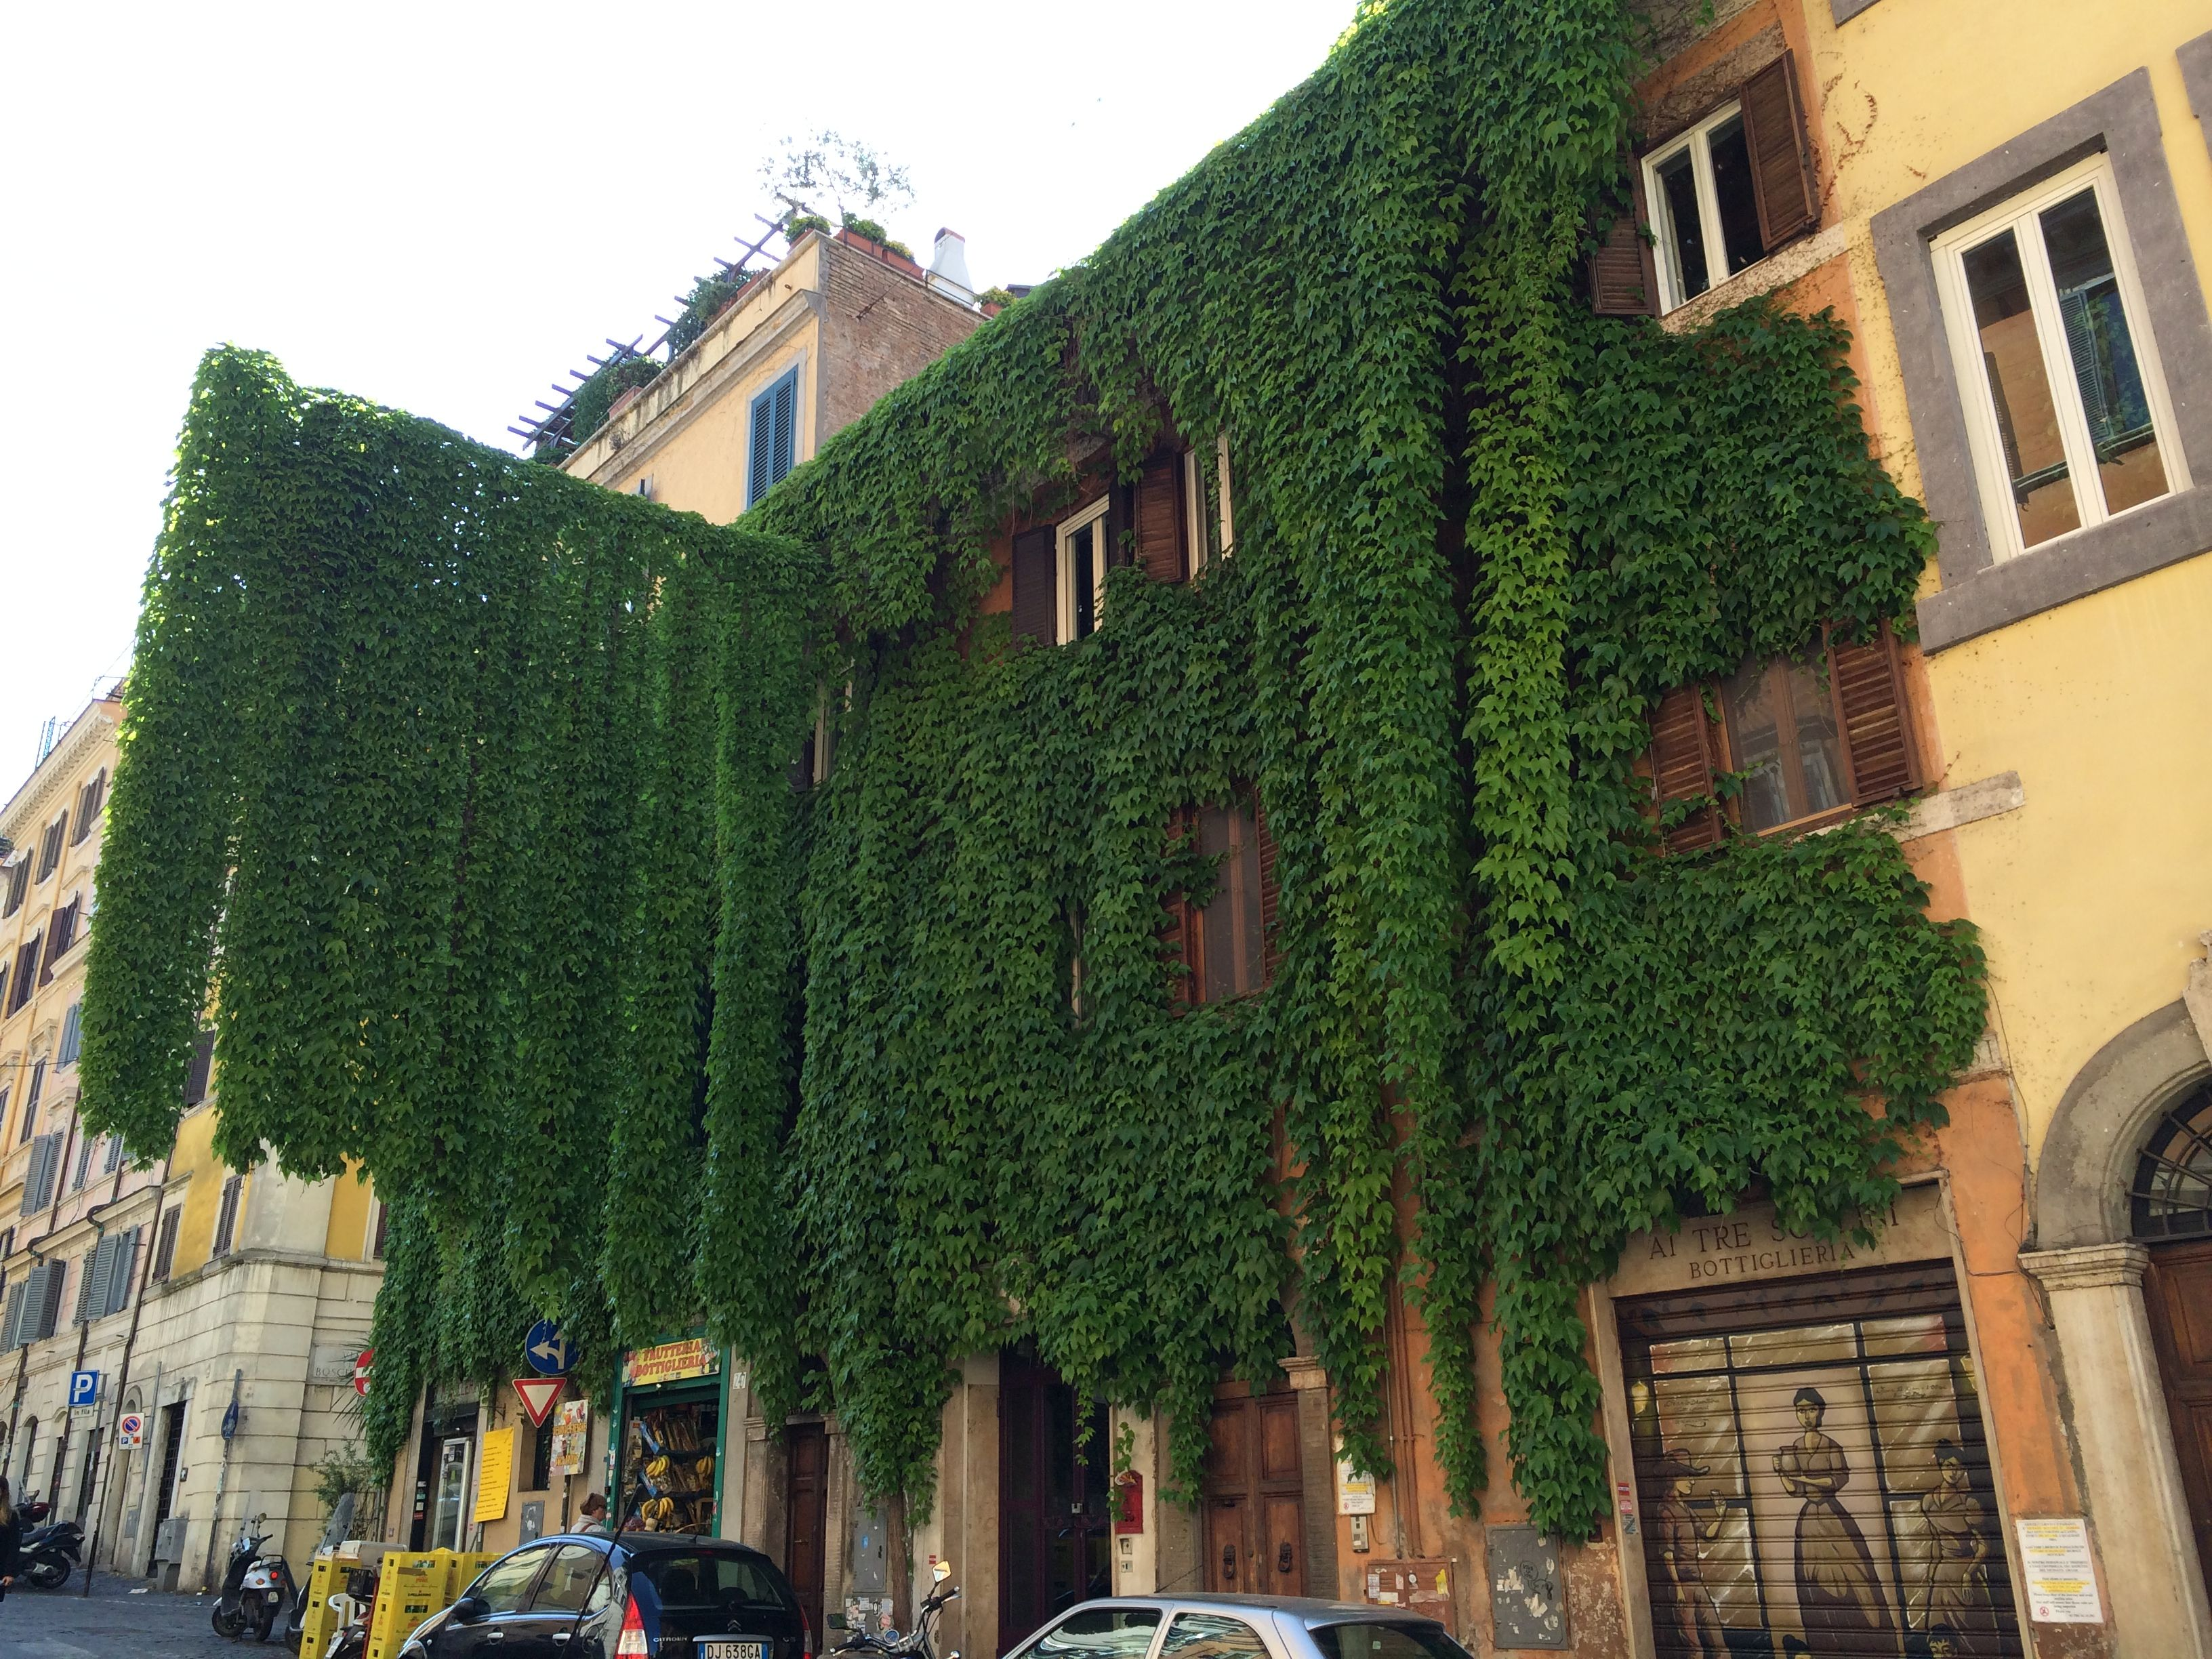 Groengevel Rome 1